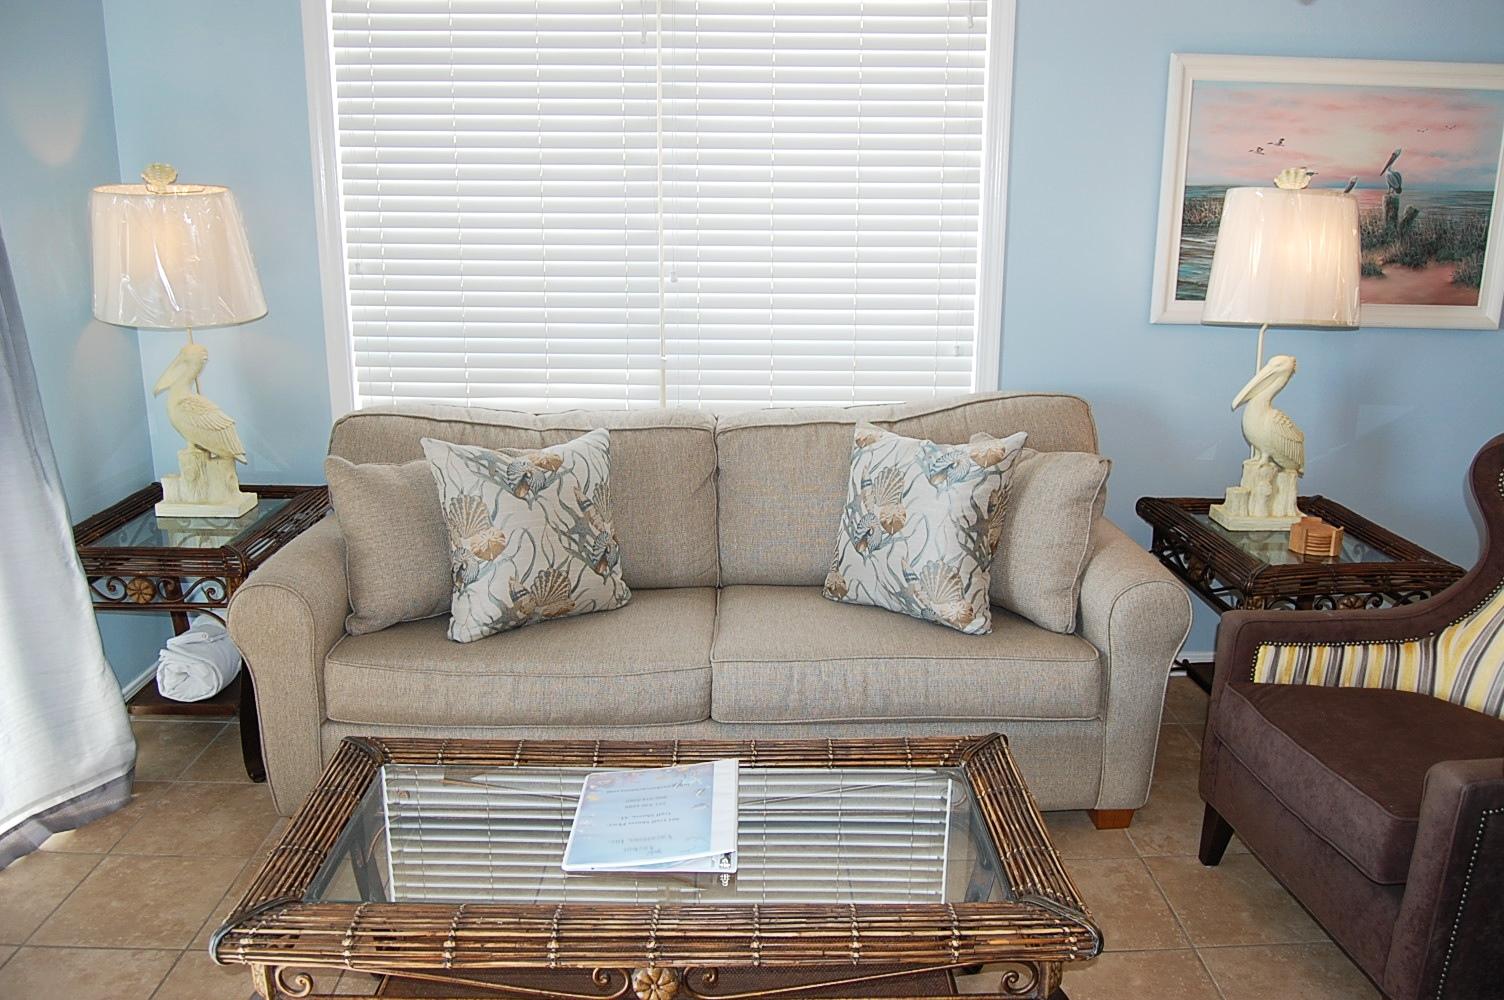 Awbrey House House/Cottage rental in Gulf Shores House Rentals in Gulf Shores Alabama - #18